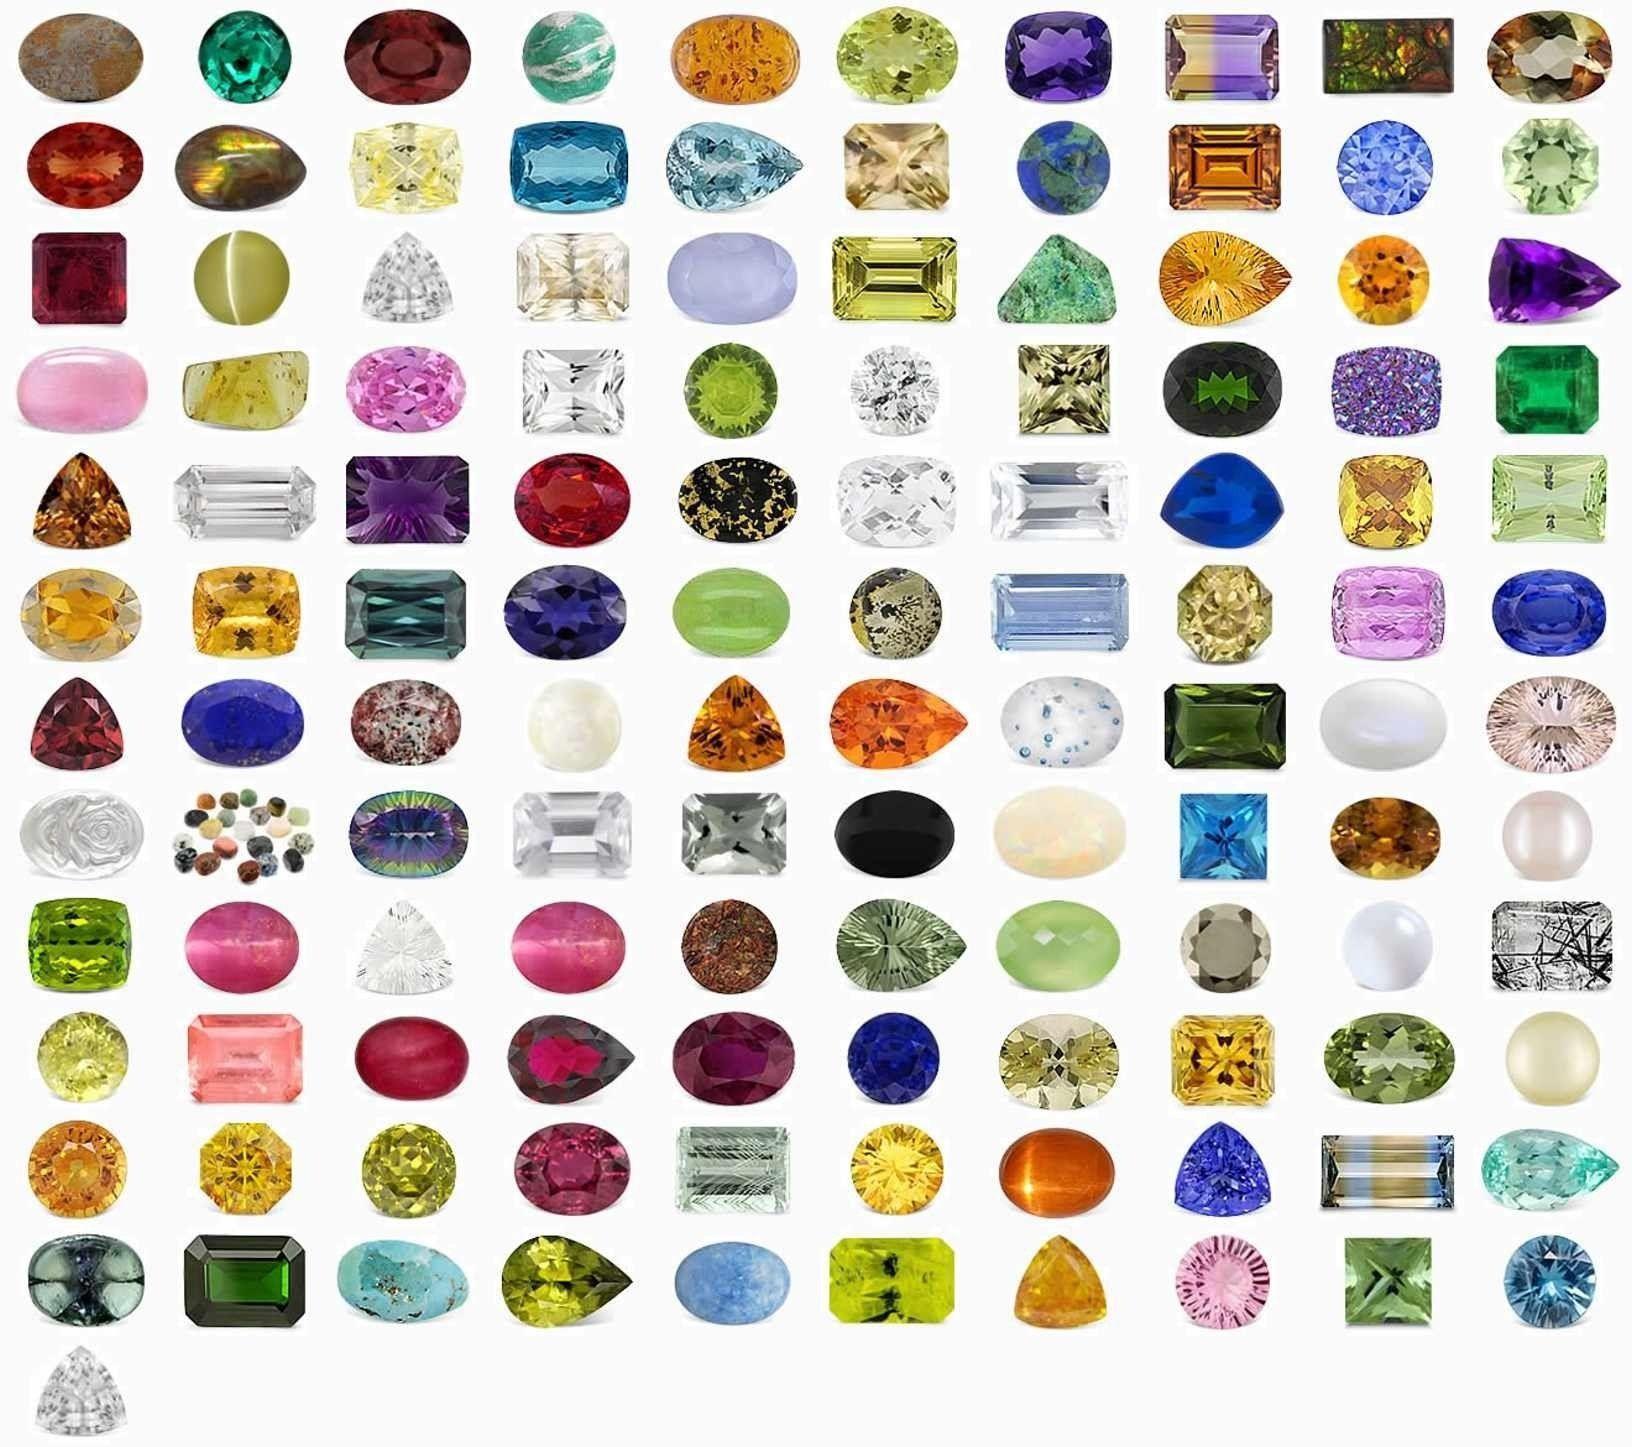 Gemstone   gemstones and misconceptions wearing gemstones is ...